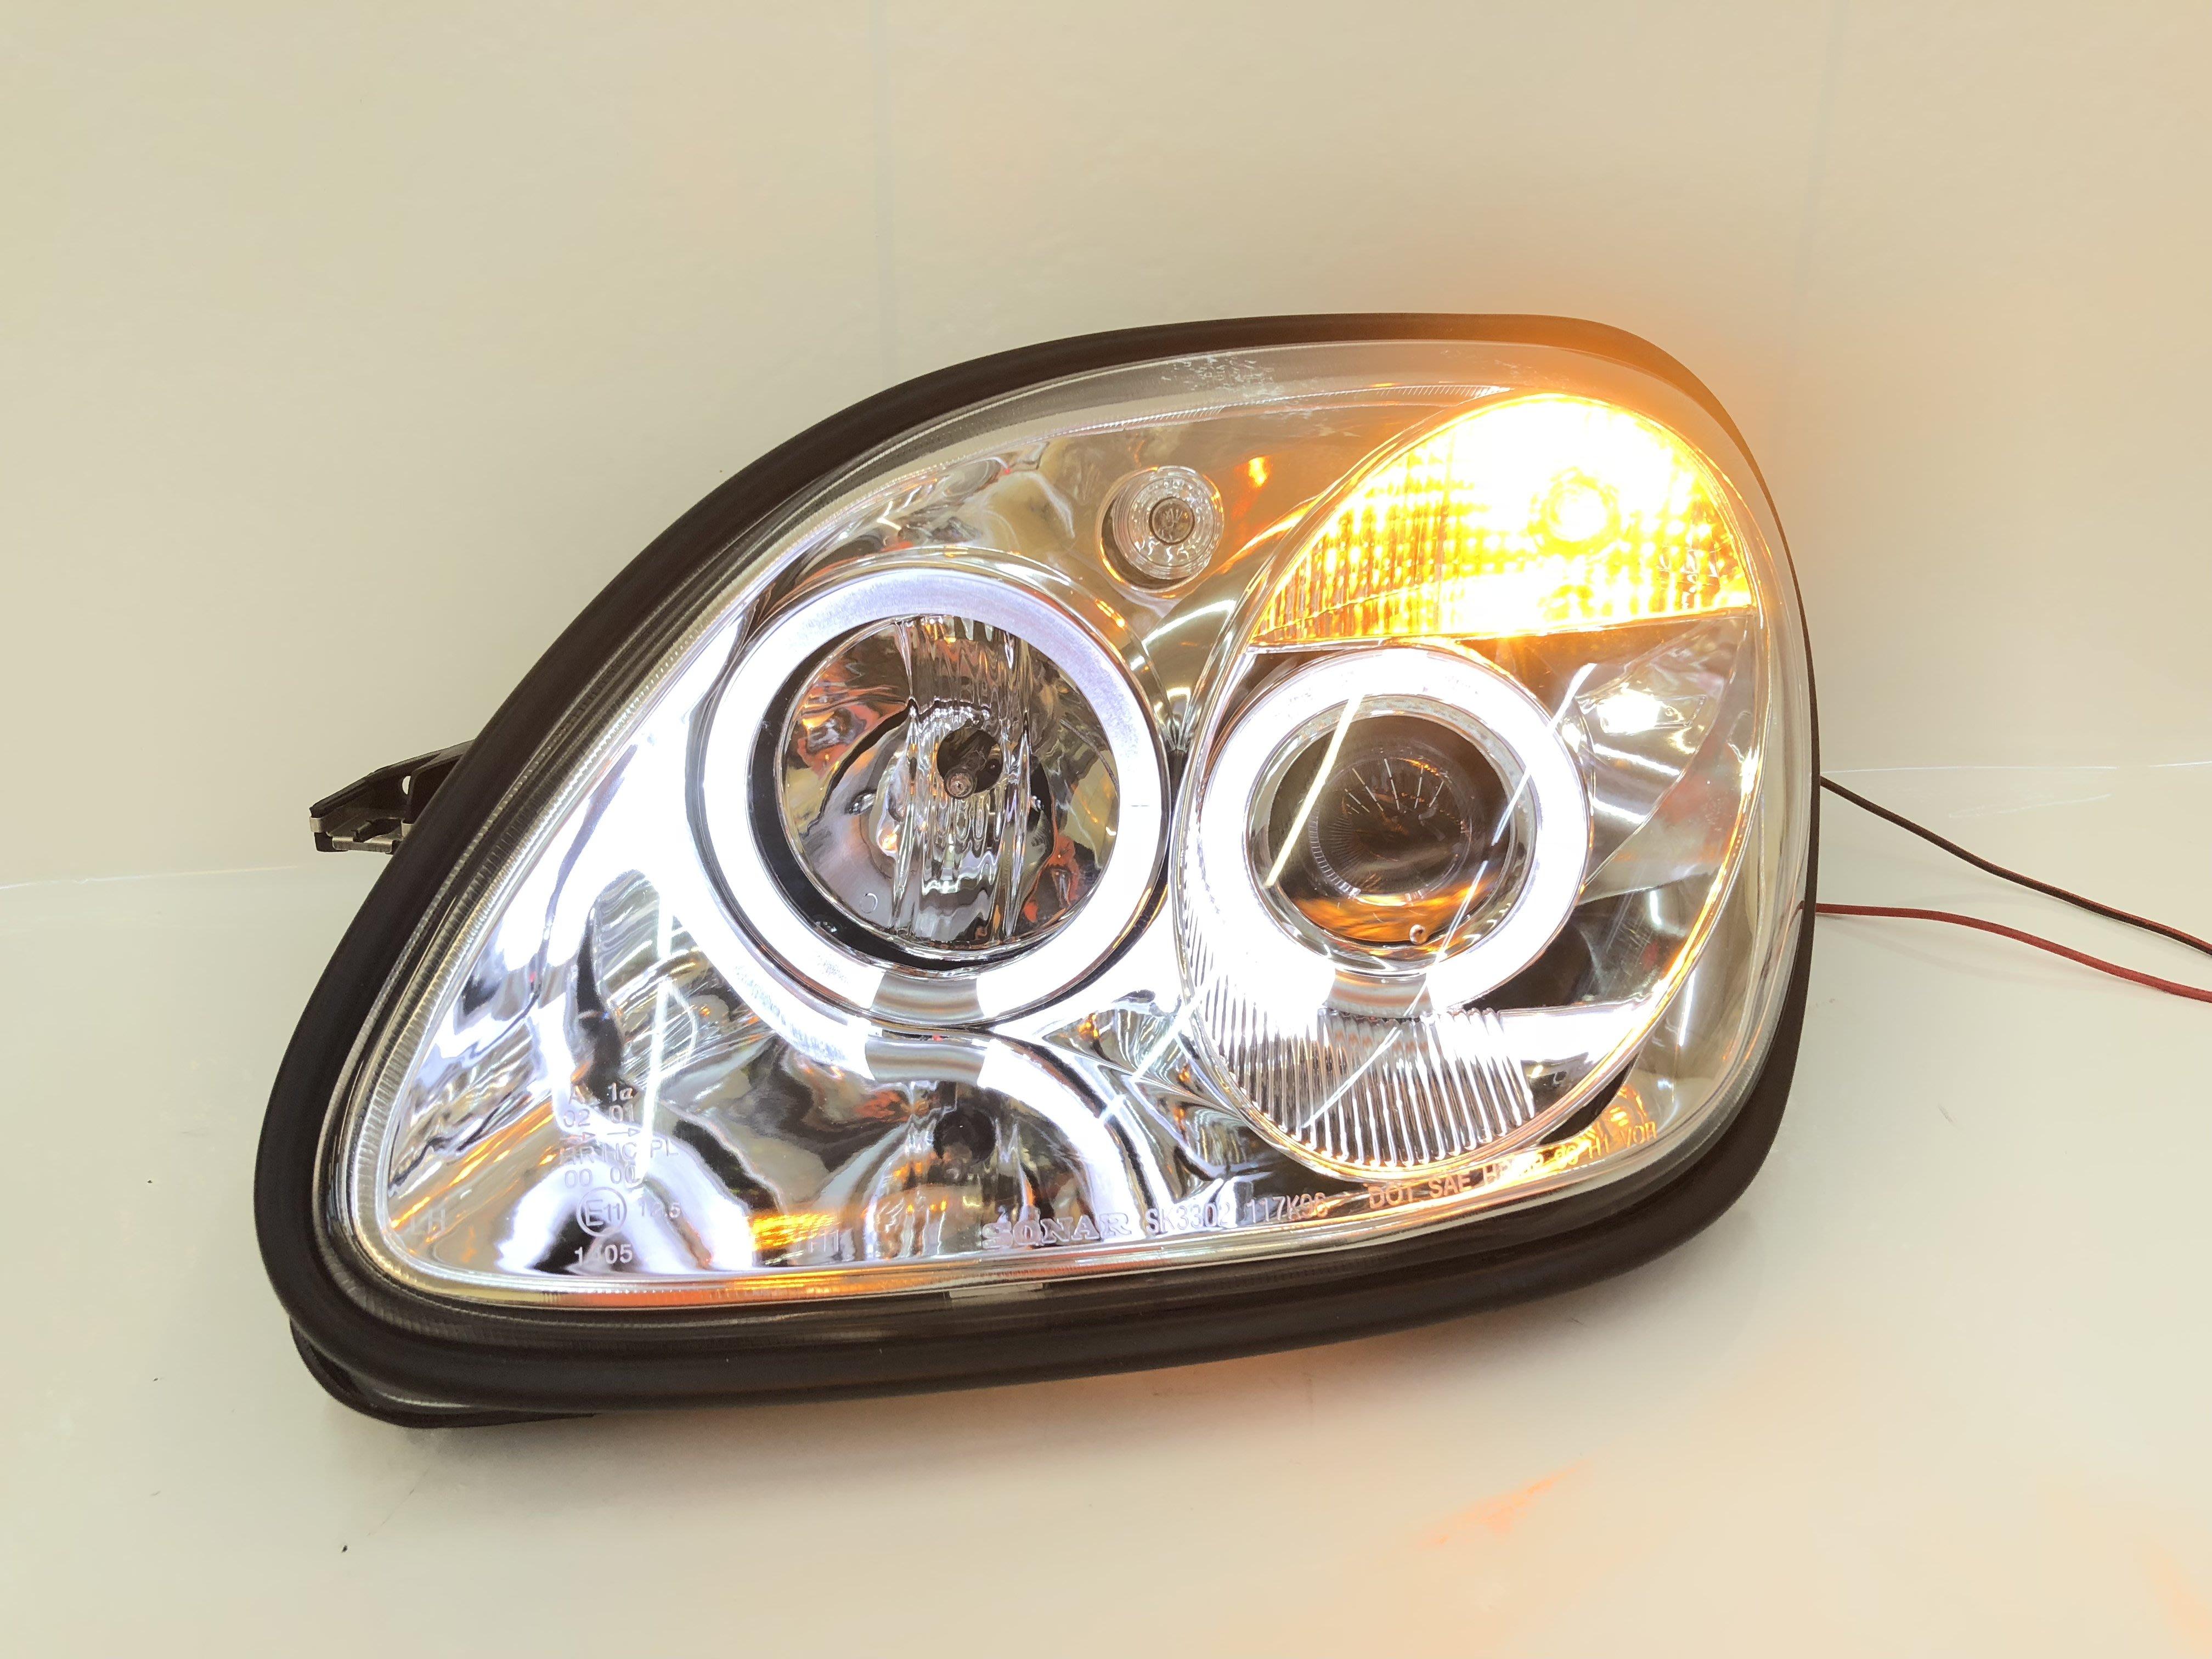 【合豐源 車燈】R170 大燈 頭燈 LED 光圈 96-02年 SLK 200